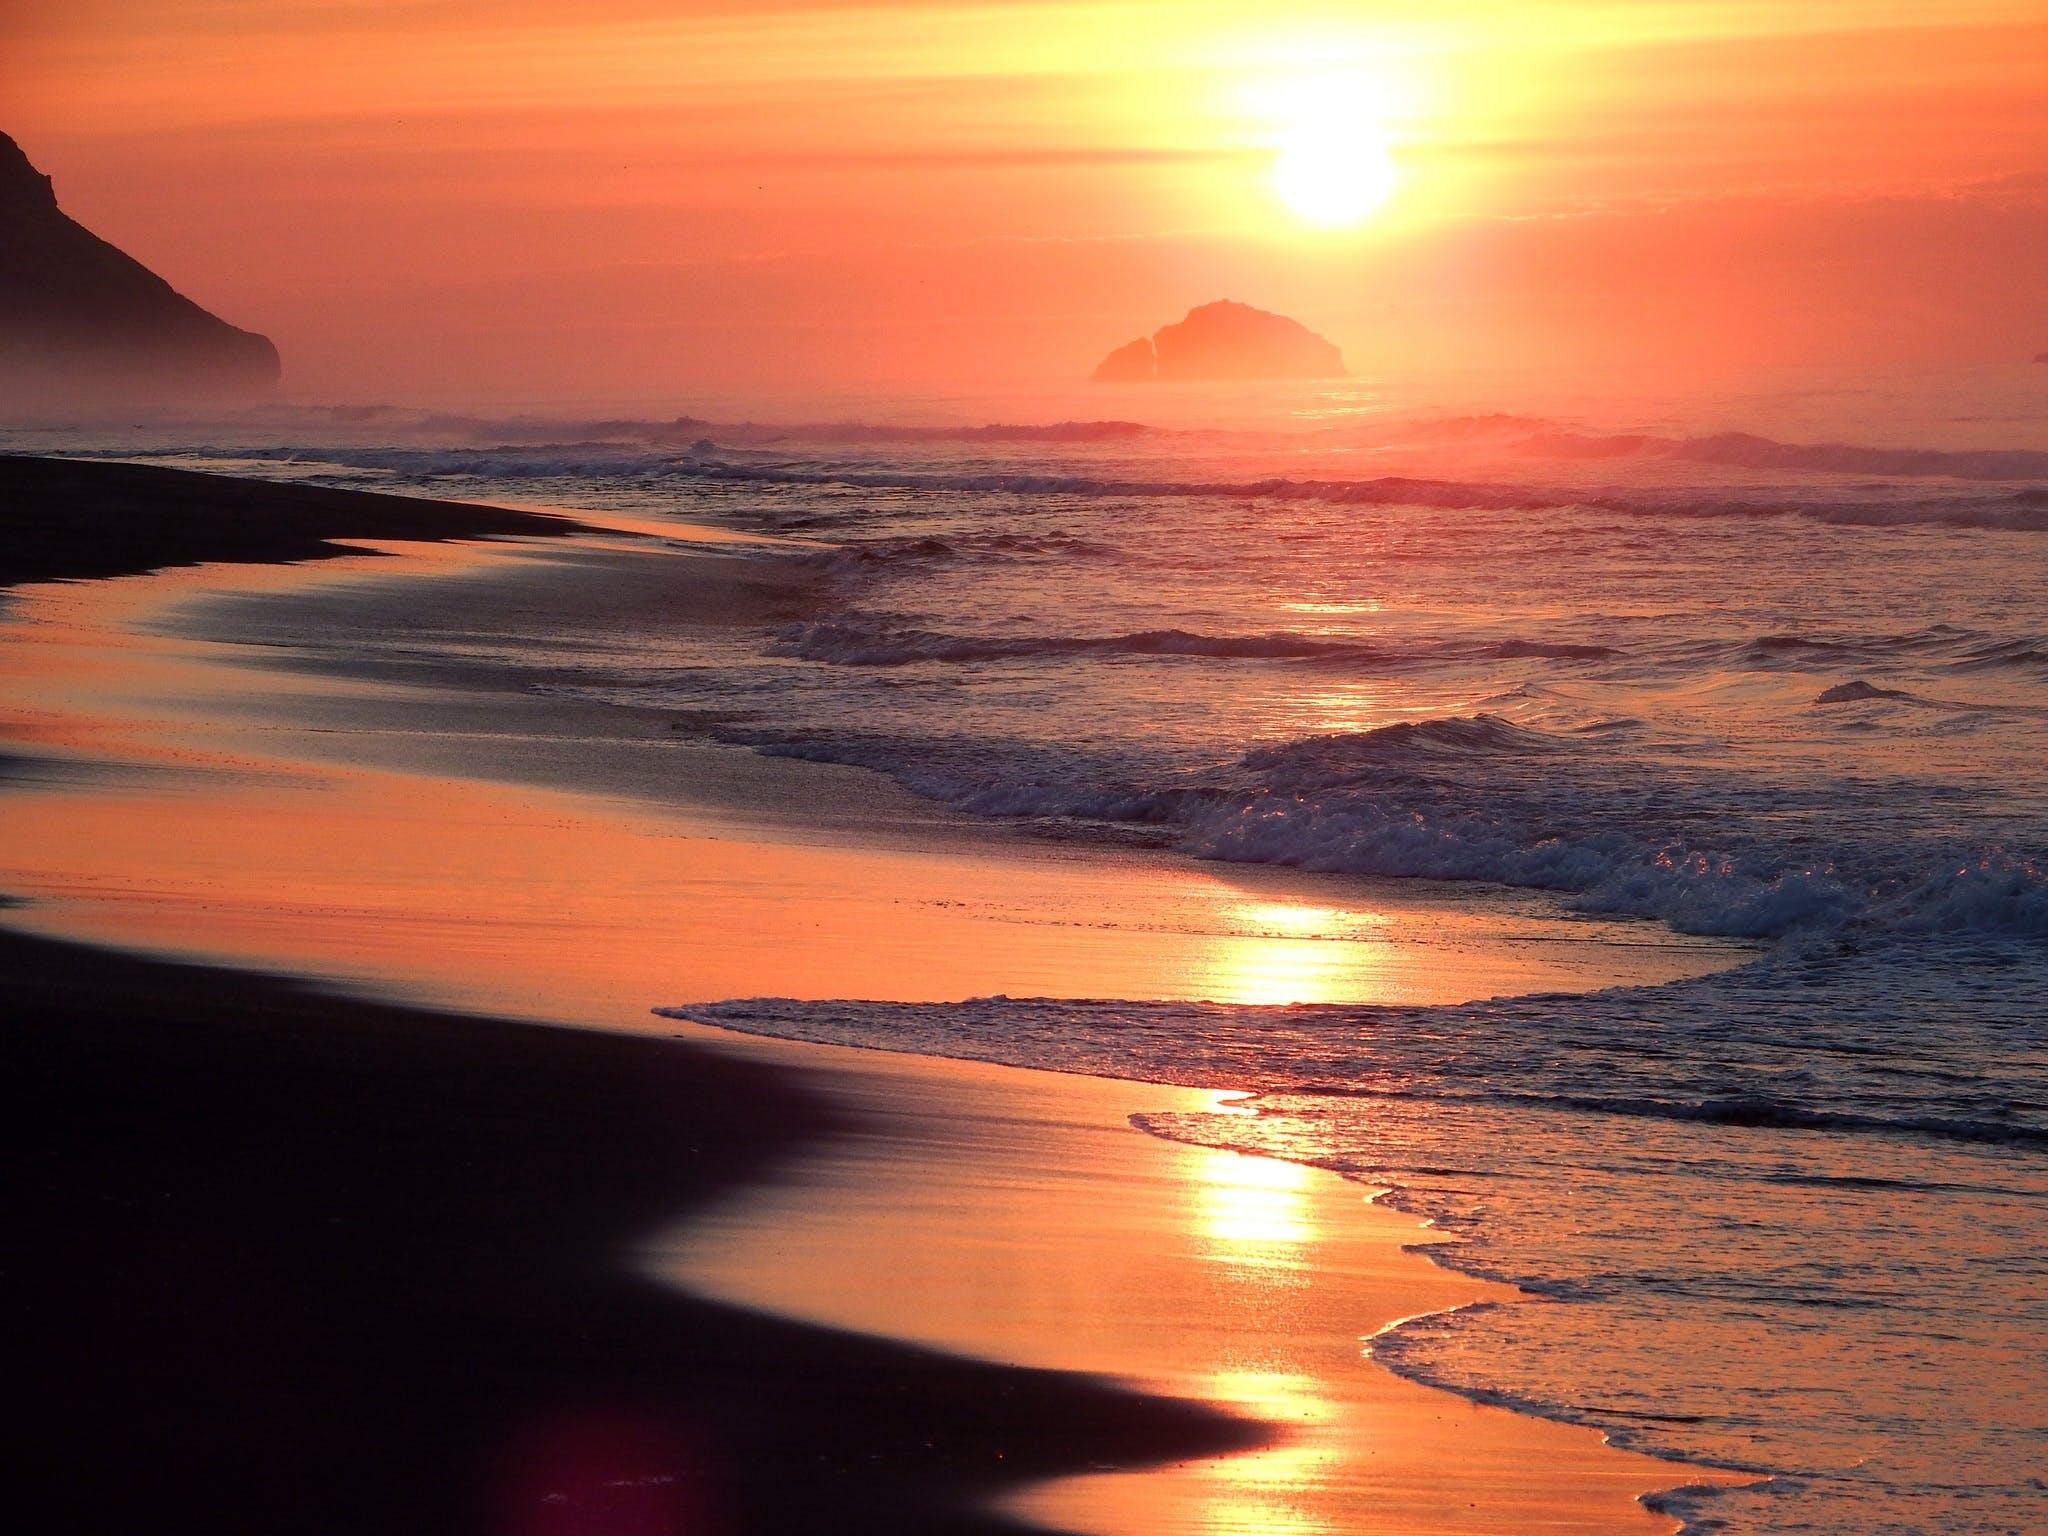 Kostenloses Stock Foto zu dämmerung, himmel, meer, meeresküste